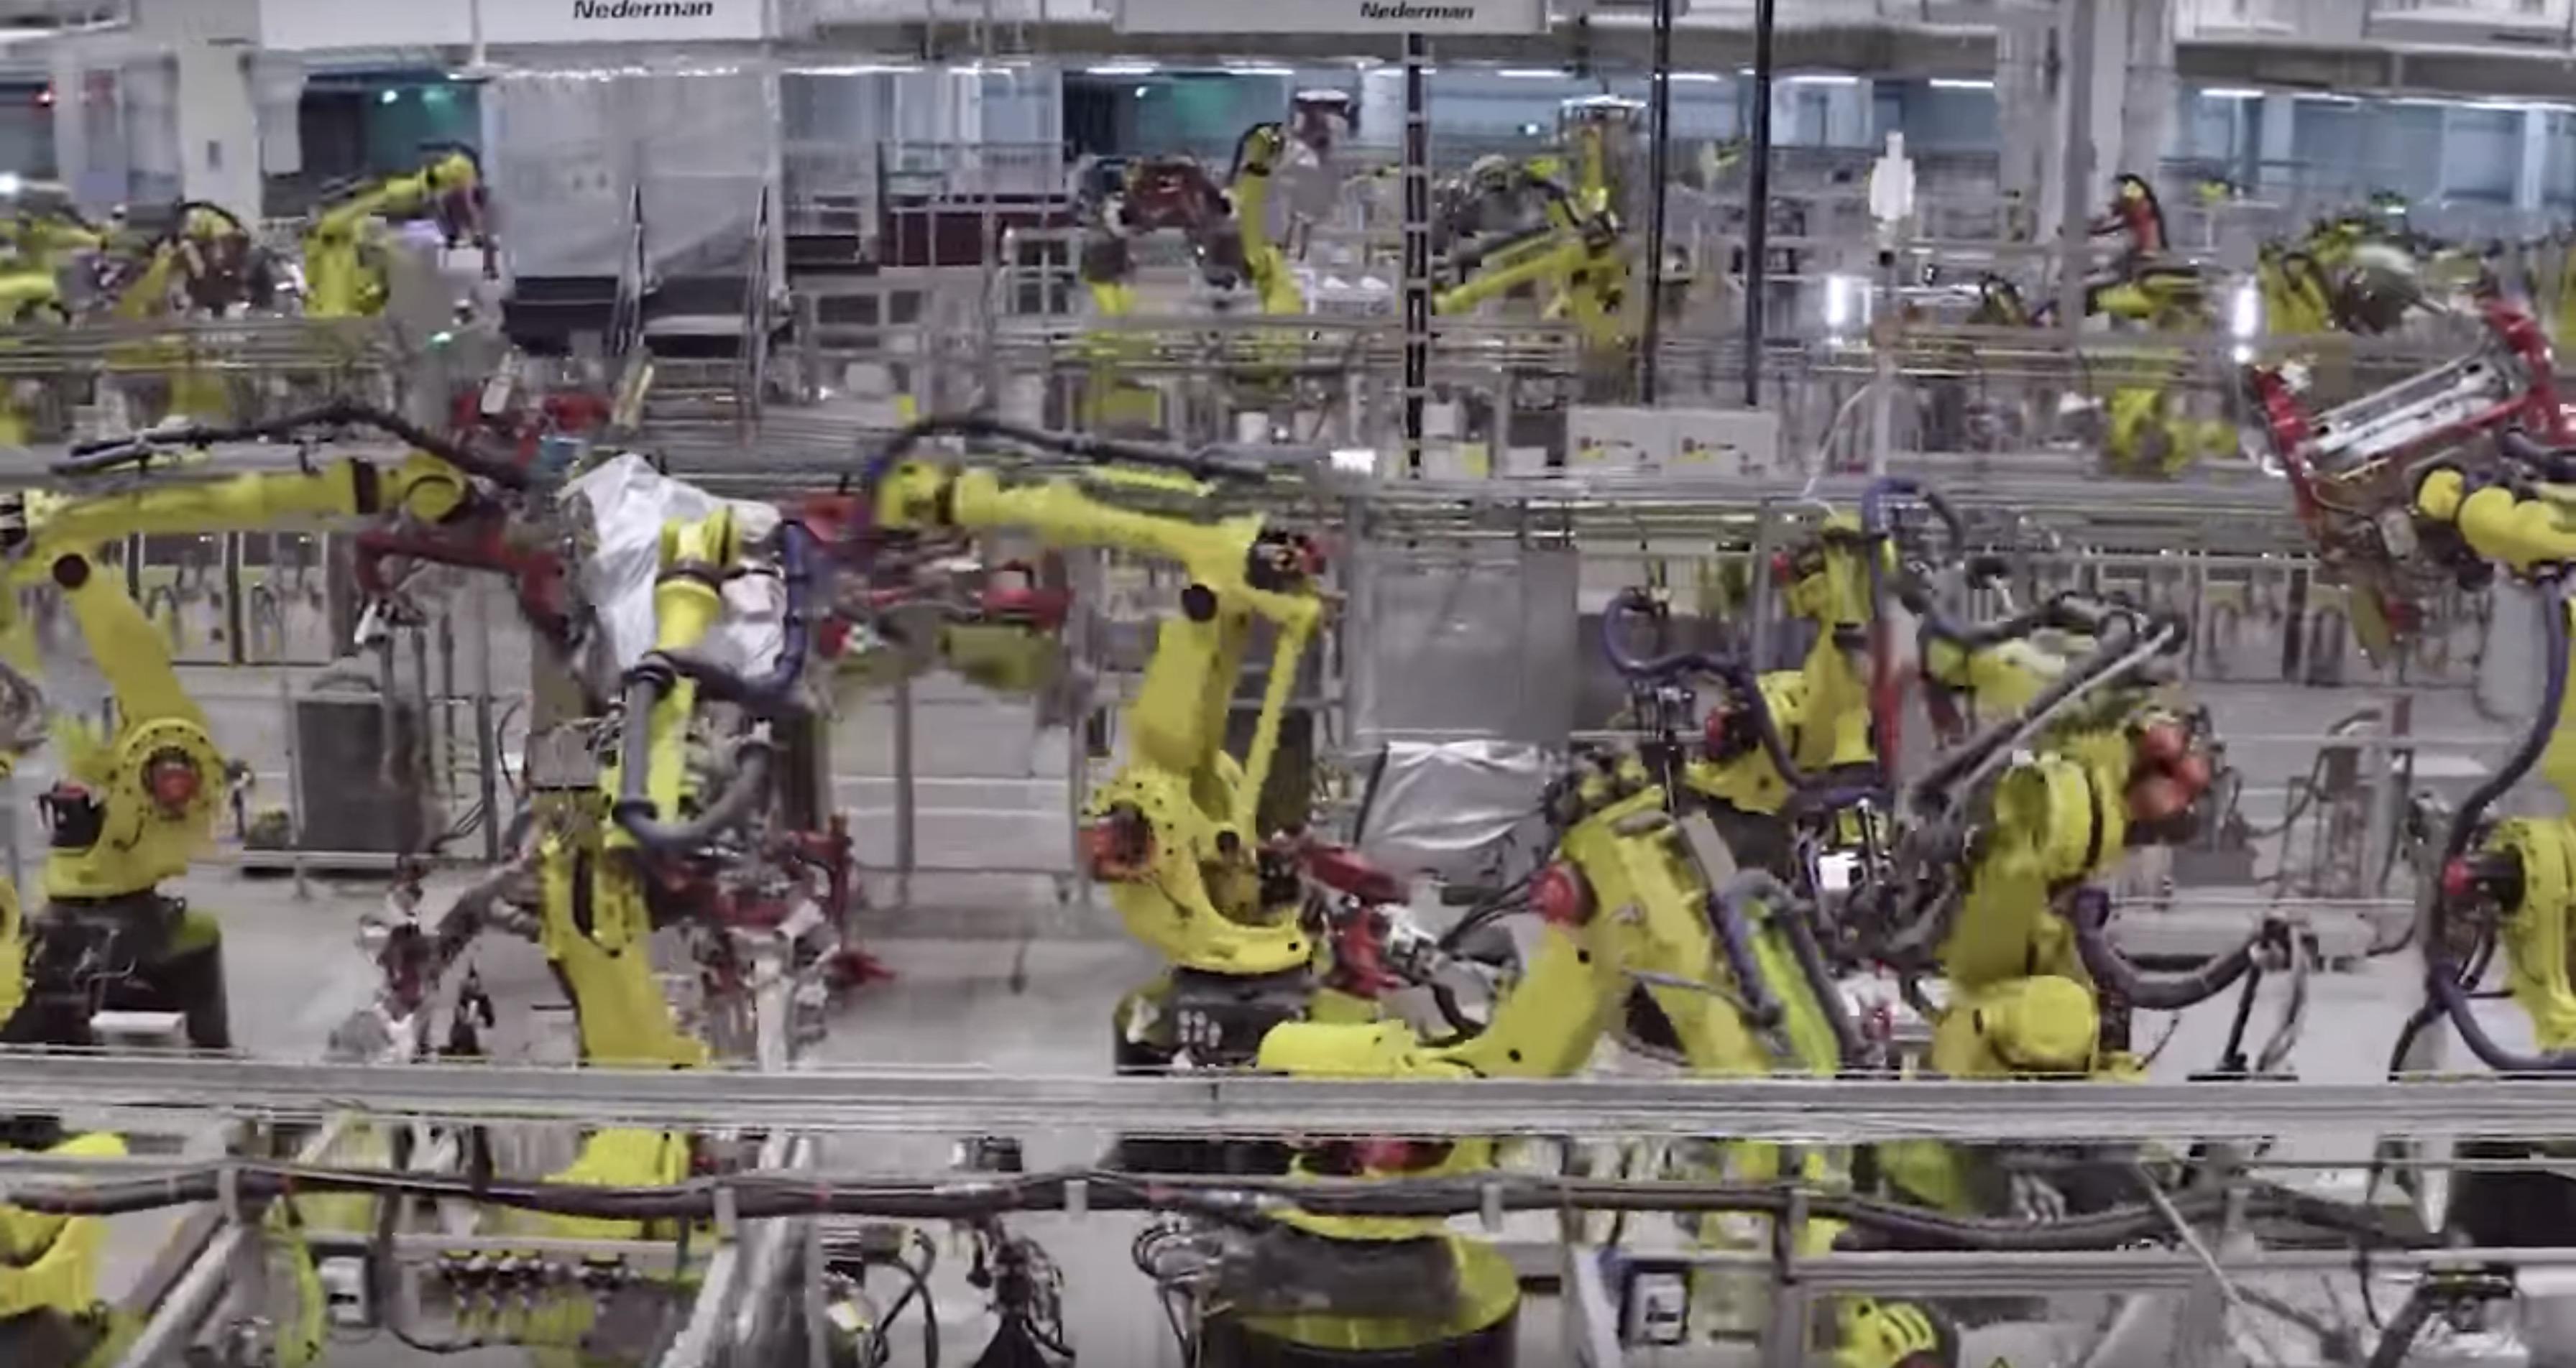 Tesla releases impressive look inside Gigafactory Shanghai, with its  hundreds of robots - Electrek